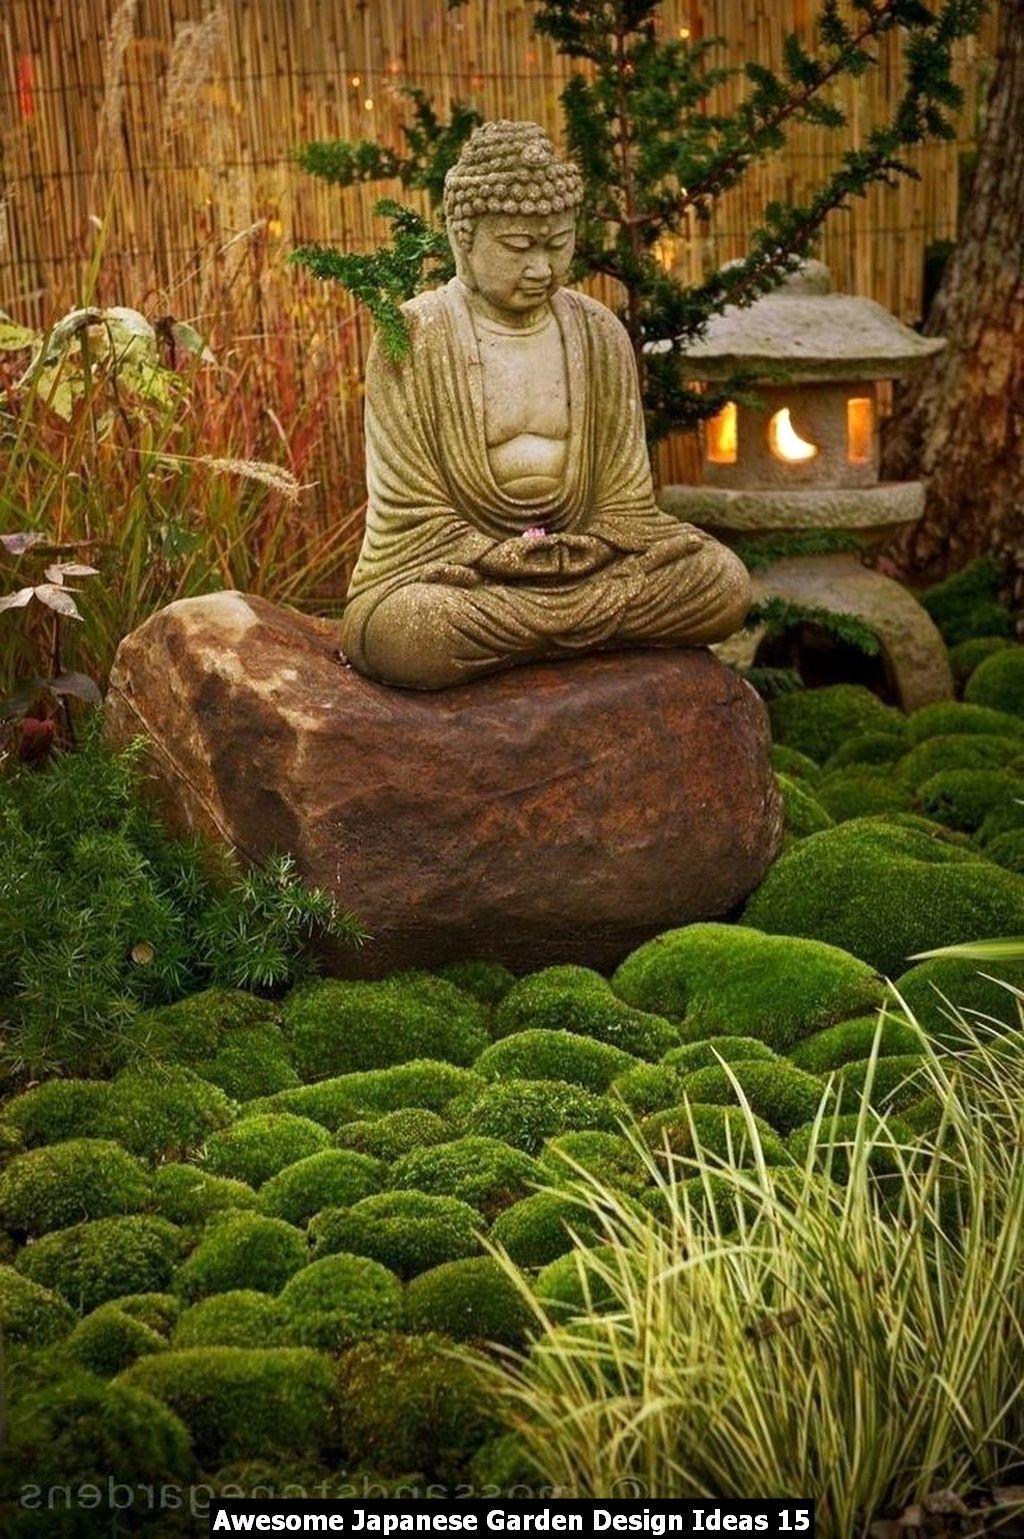 Awesome Japanese Garden Design Ideas Homyhomee Zen Garden Design Zen Garden Diy Zen Garden